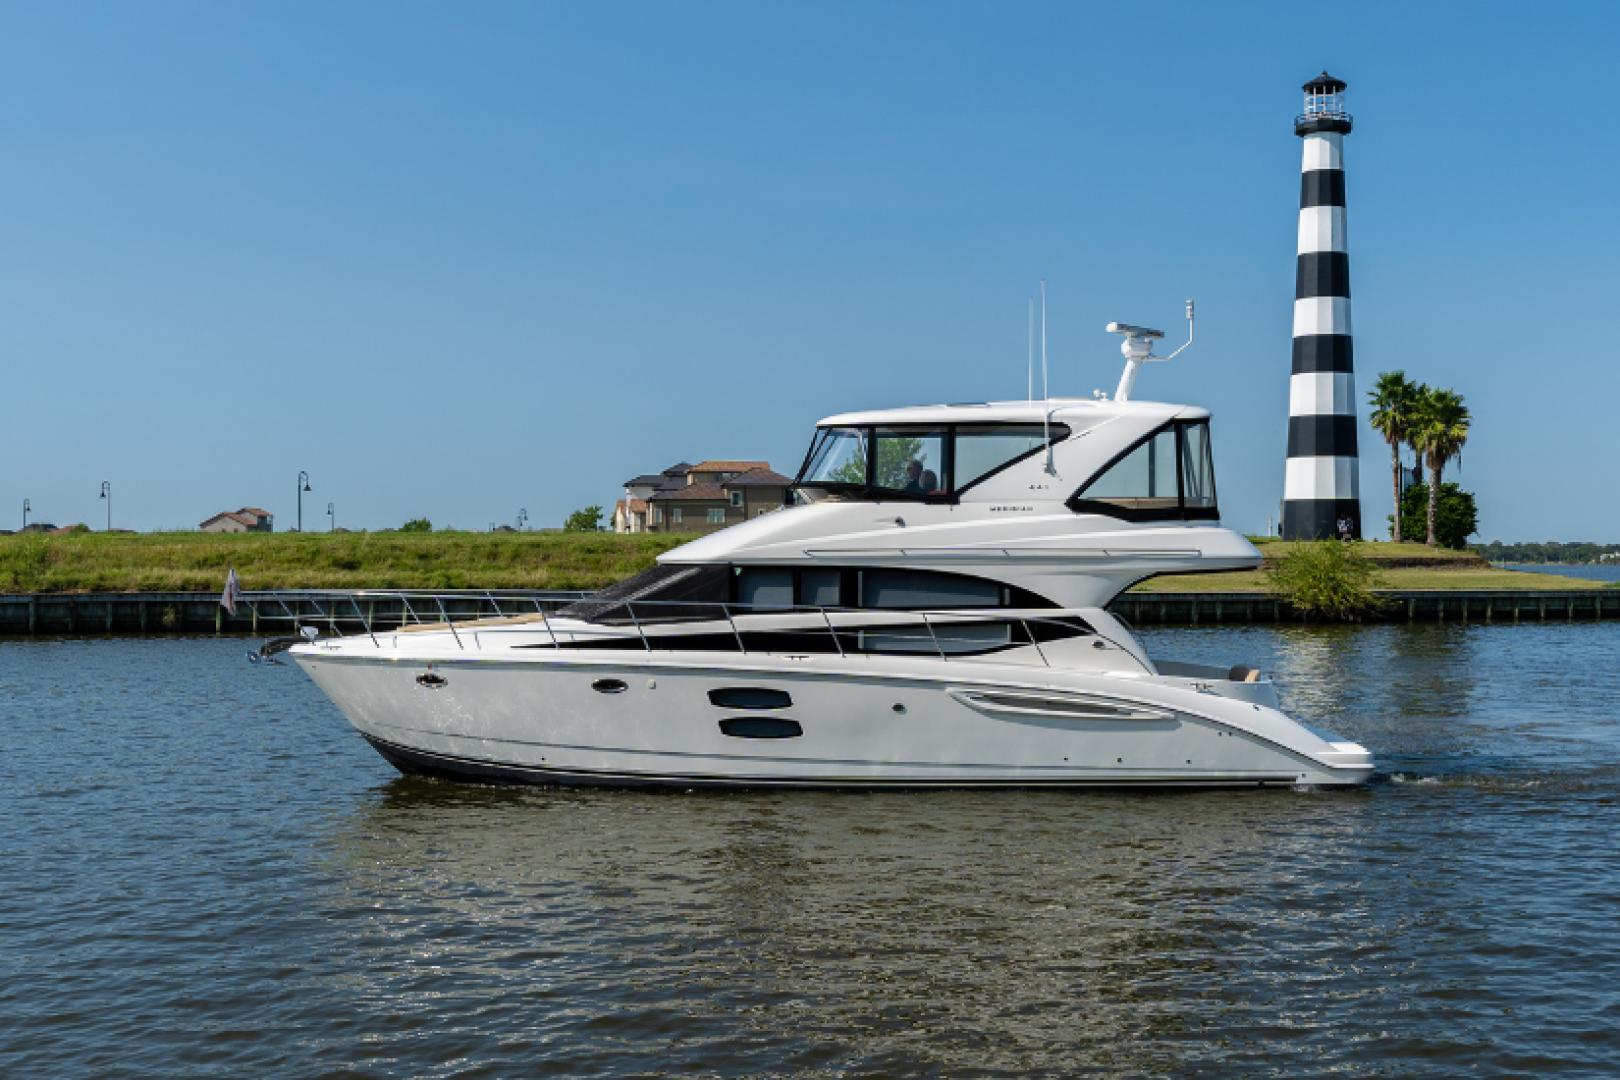 Meridian-441 Motor Yacht 2016-Friend Ship League City-Texas-United States-Meridian 441 2016 Friend Ship-1507311 | Thumbnail